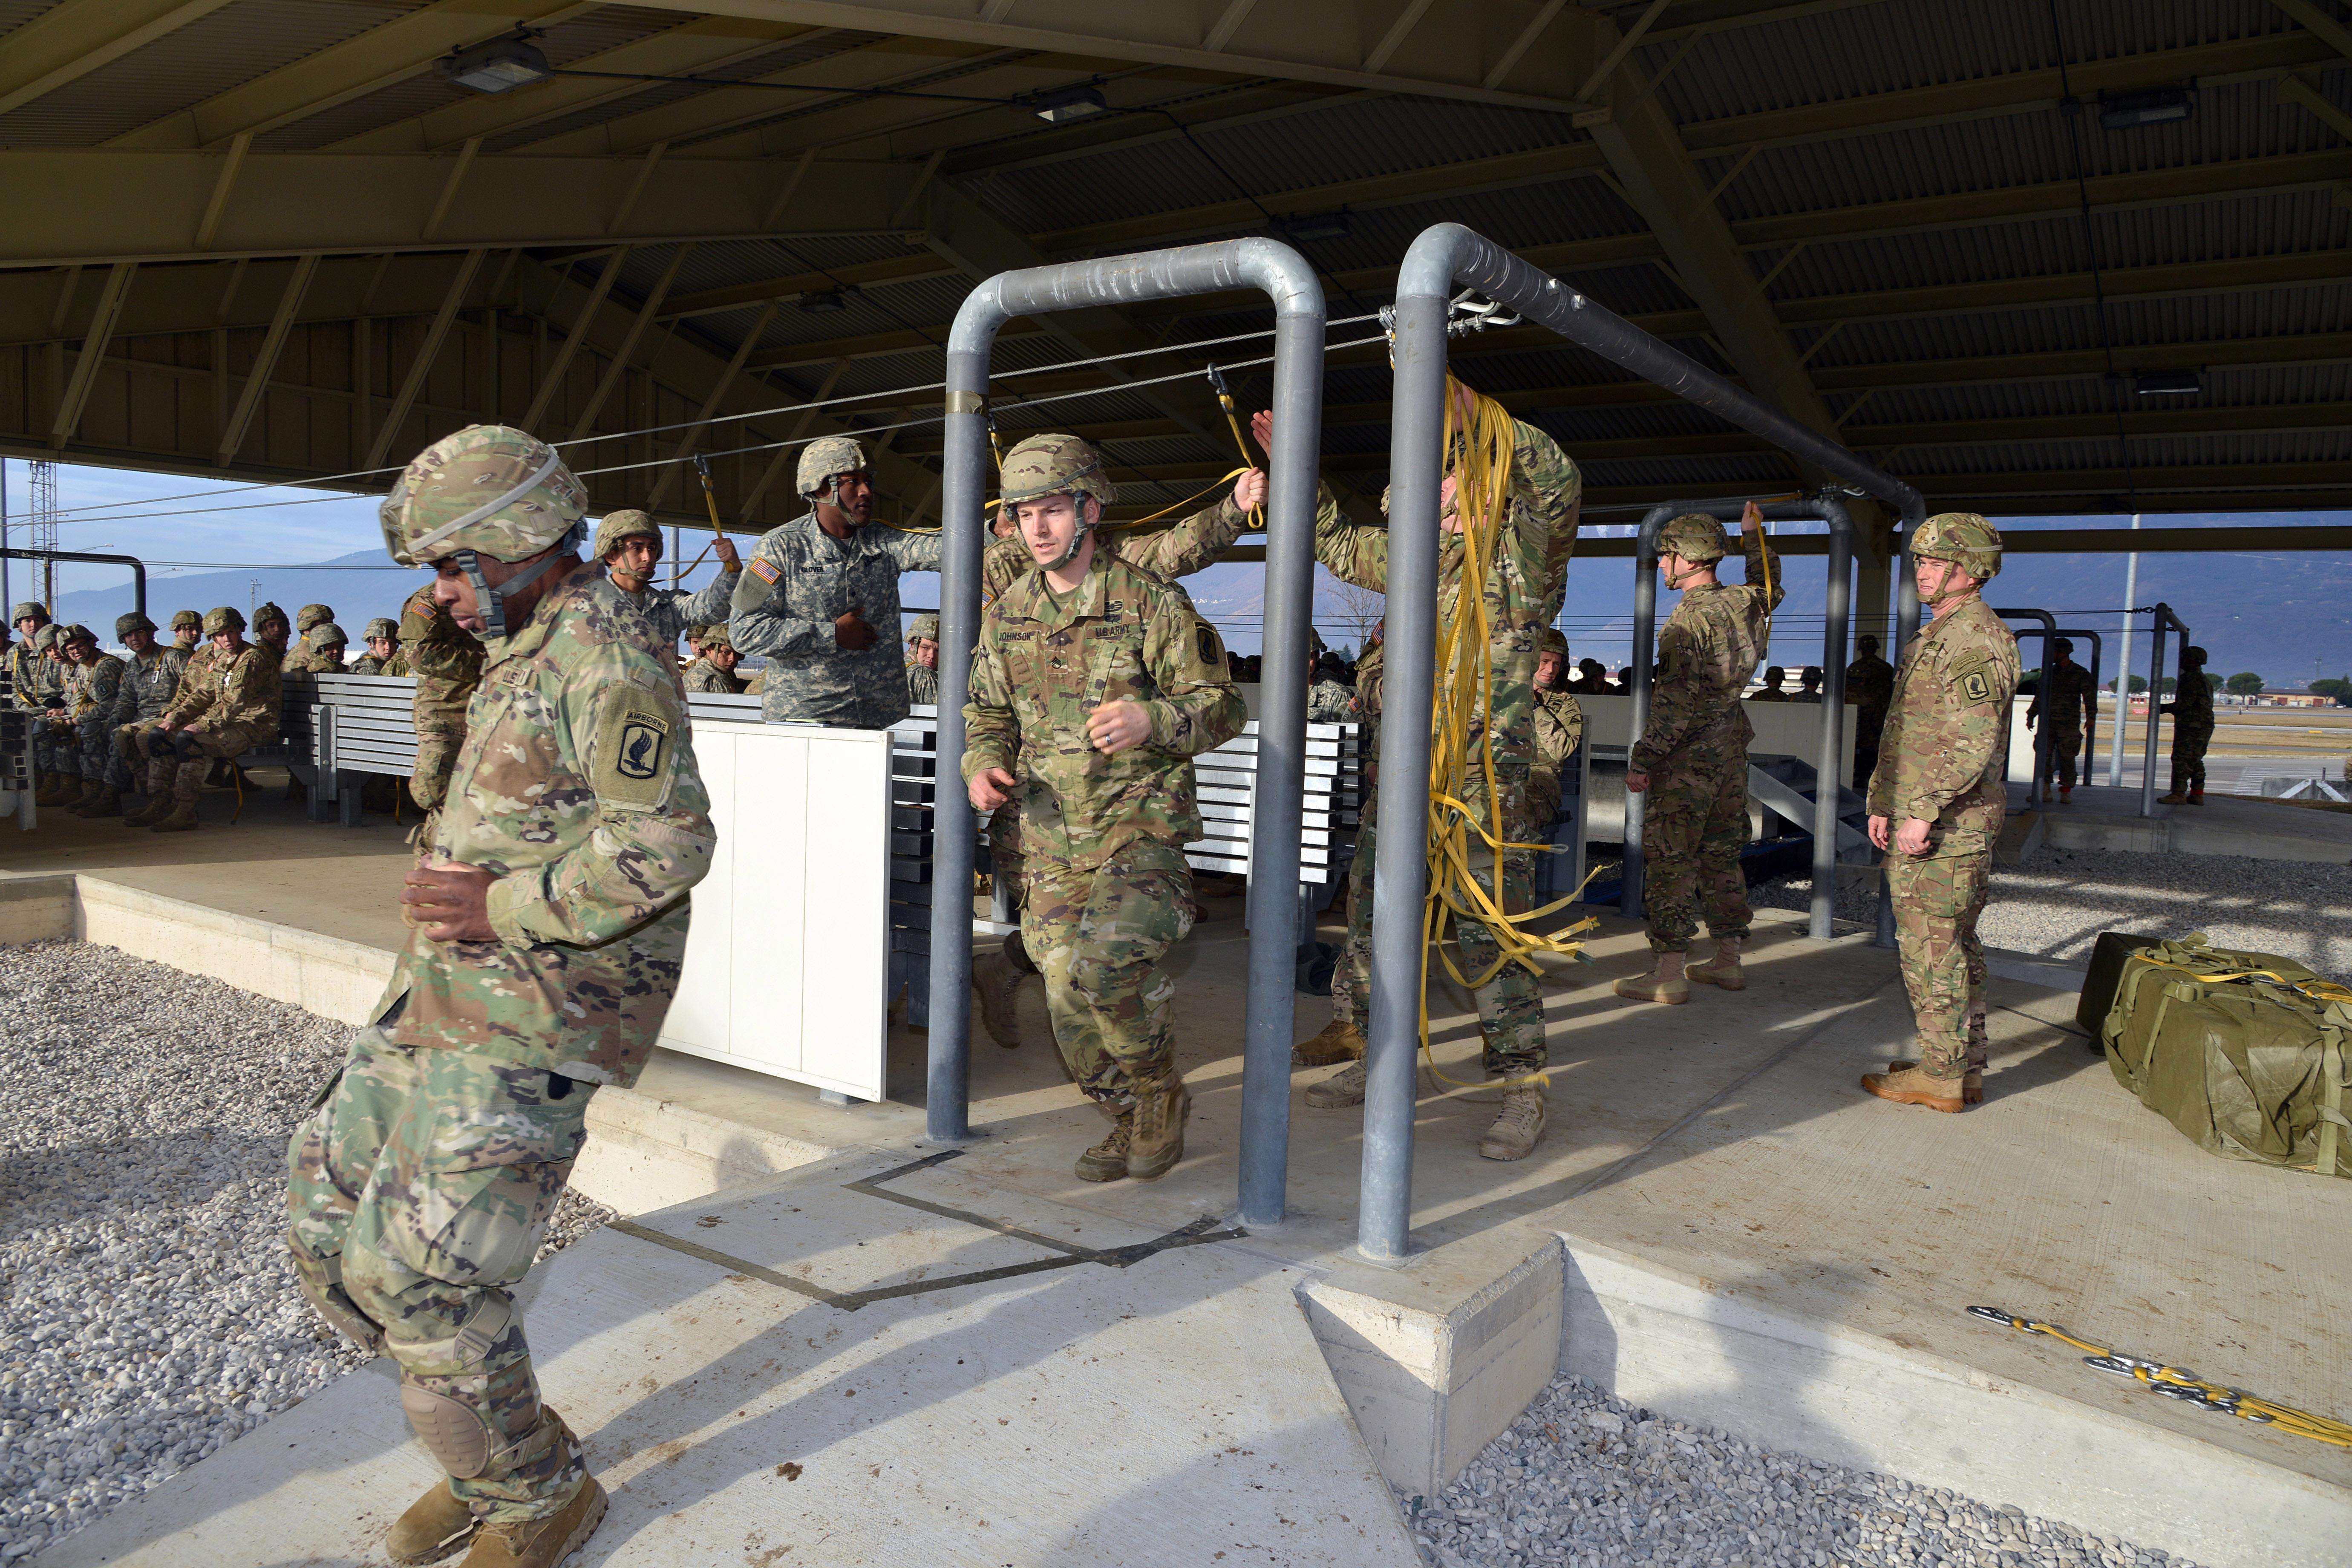 U.S. paratroopers practice door exits on the mock door trainer at Aviano Air Base Italy & U.S. DEPARTMENT OF DEFENSE \u003e Photos \u003e Photo Gallery